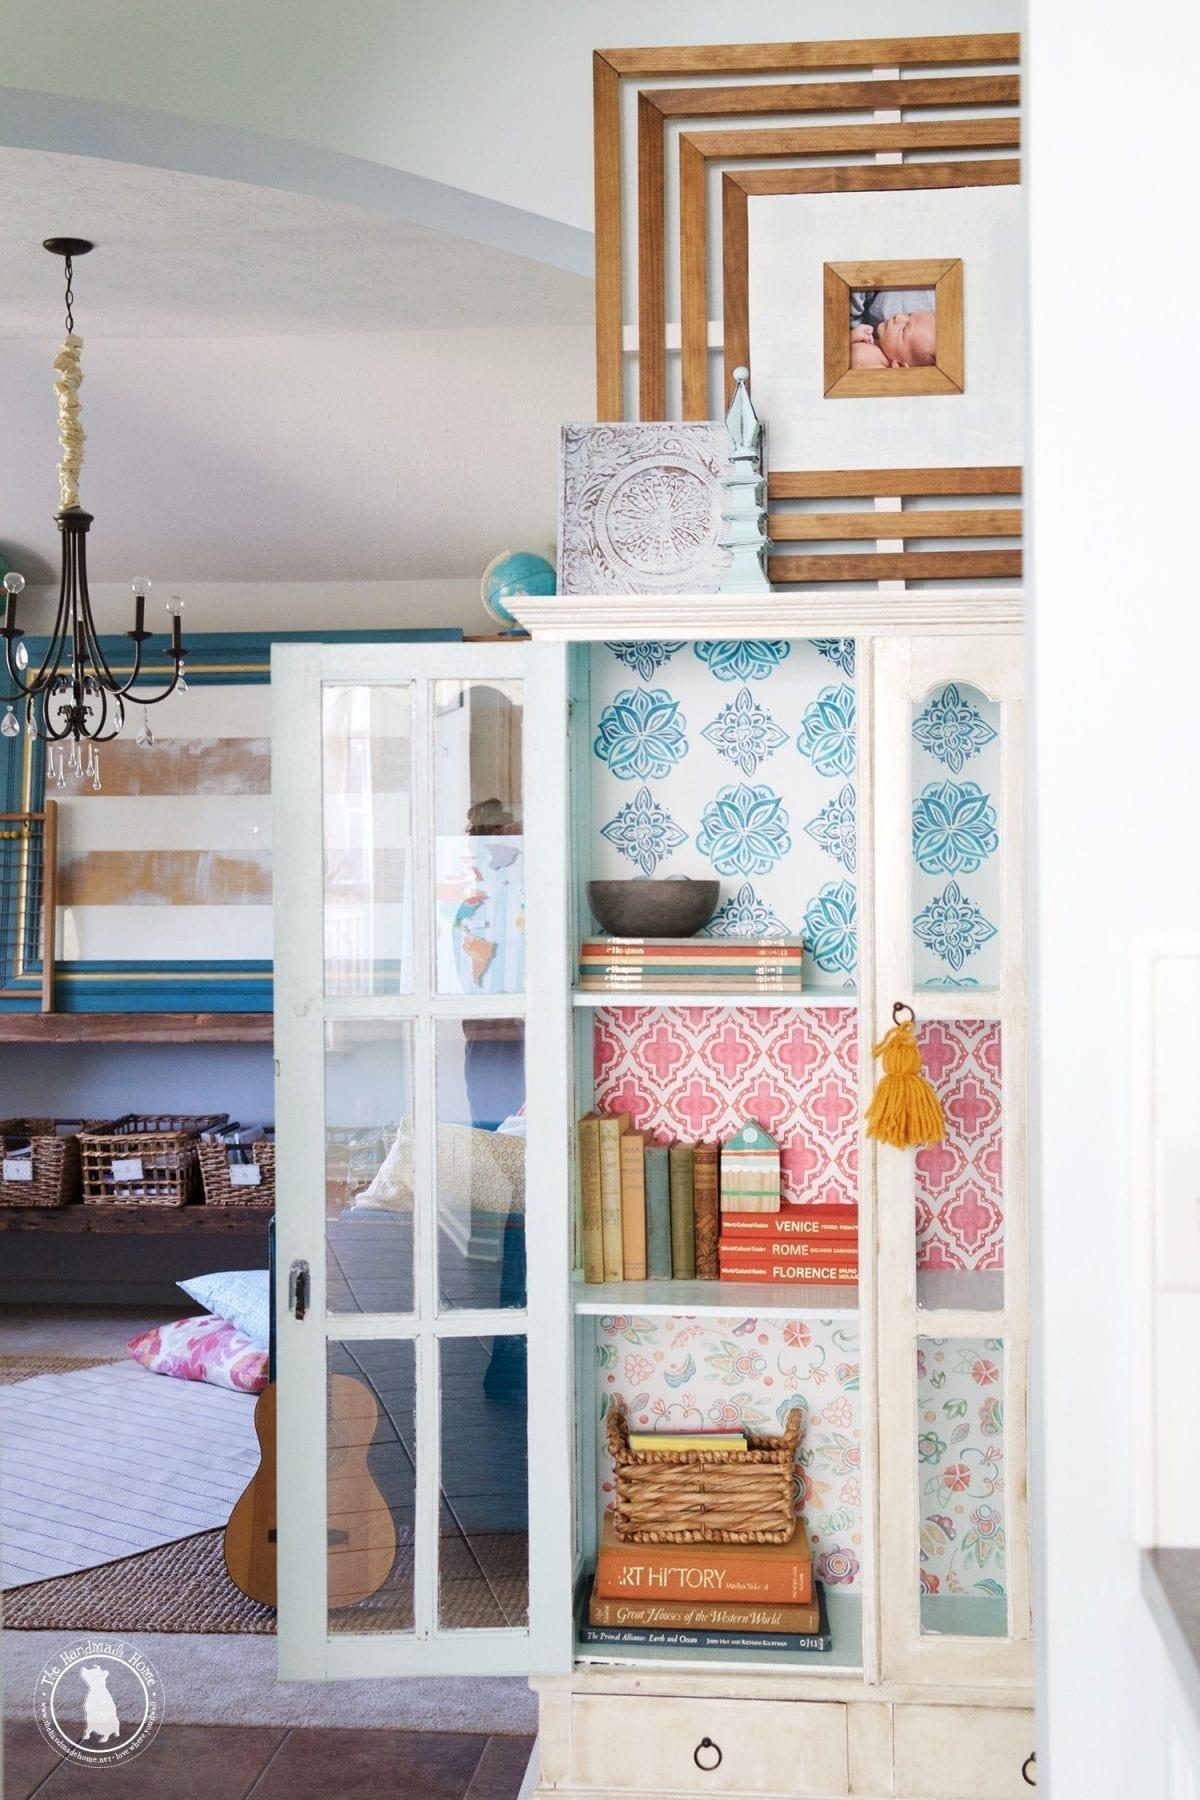 wallpaper_the_handmade_home